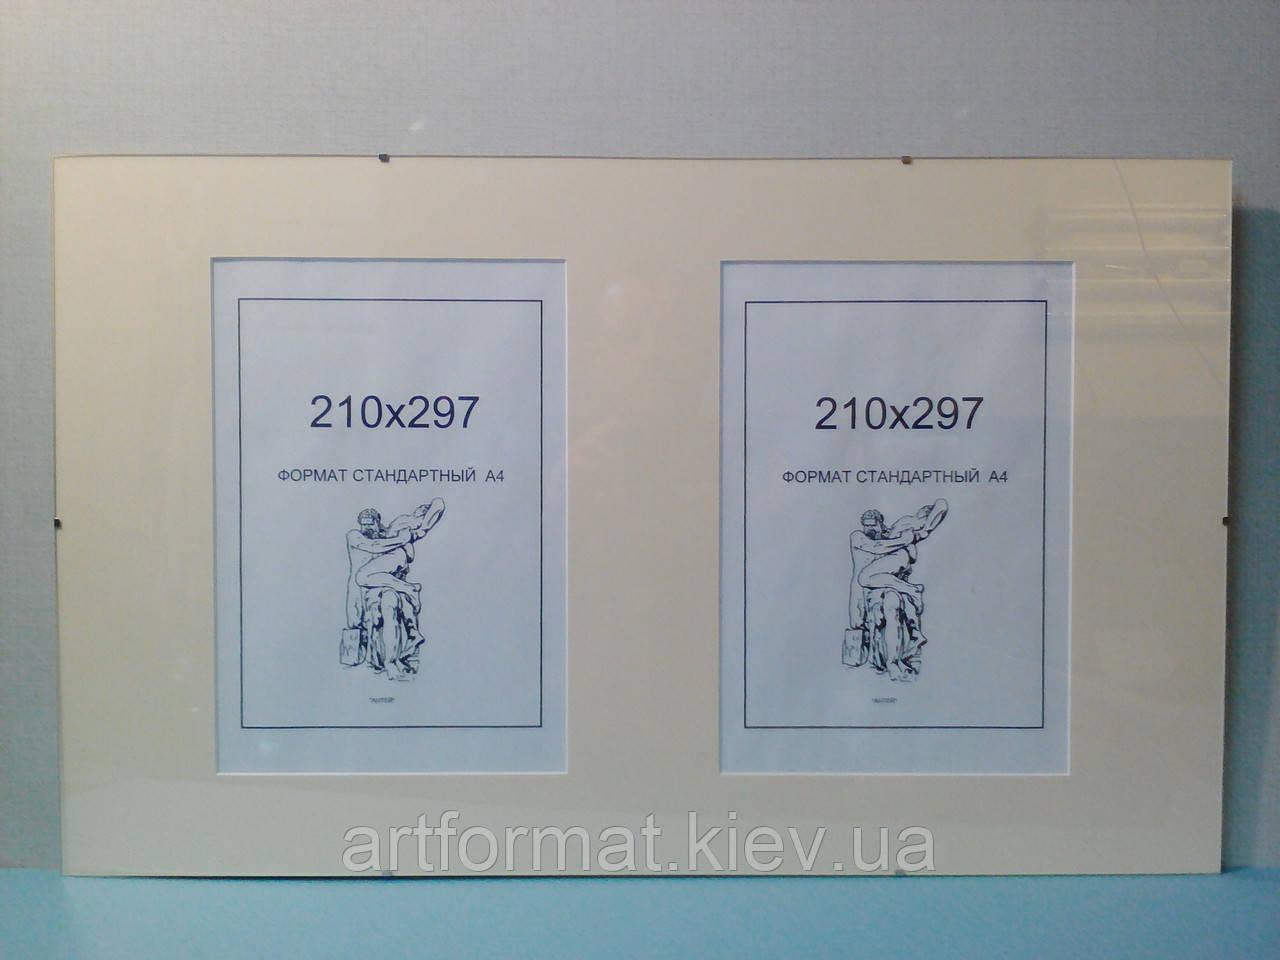 Антирама 670х410 с паспарту на 2 окна 210х297.